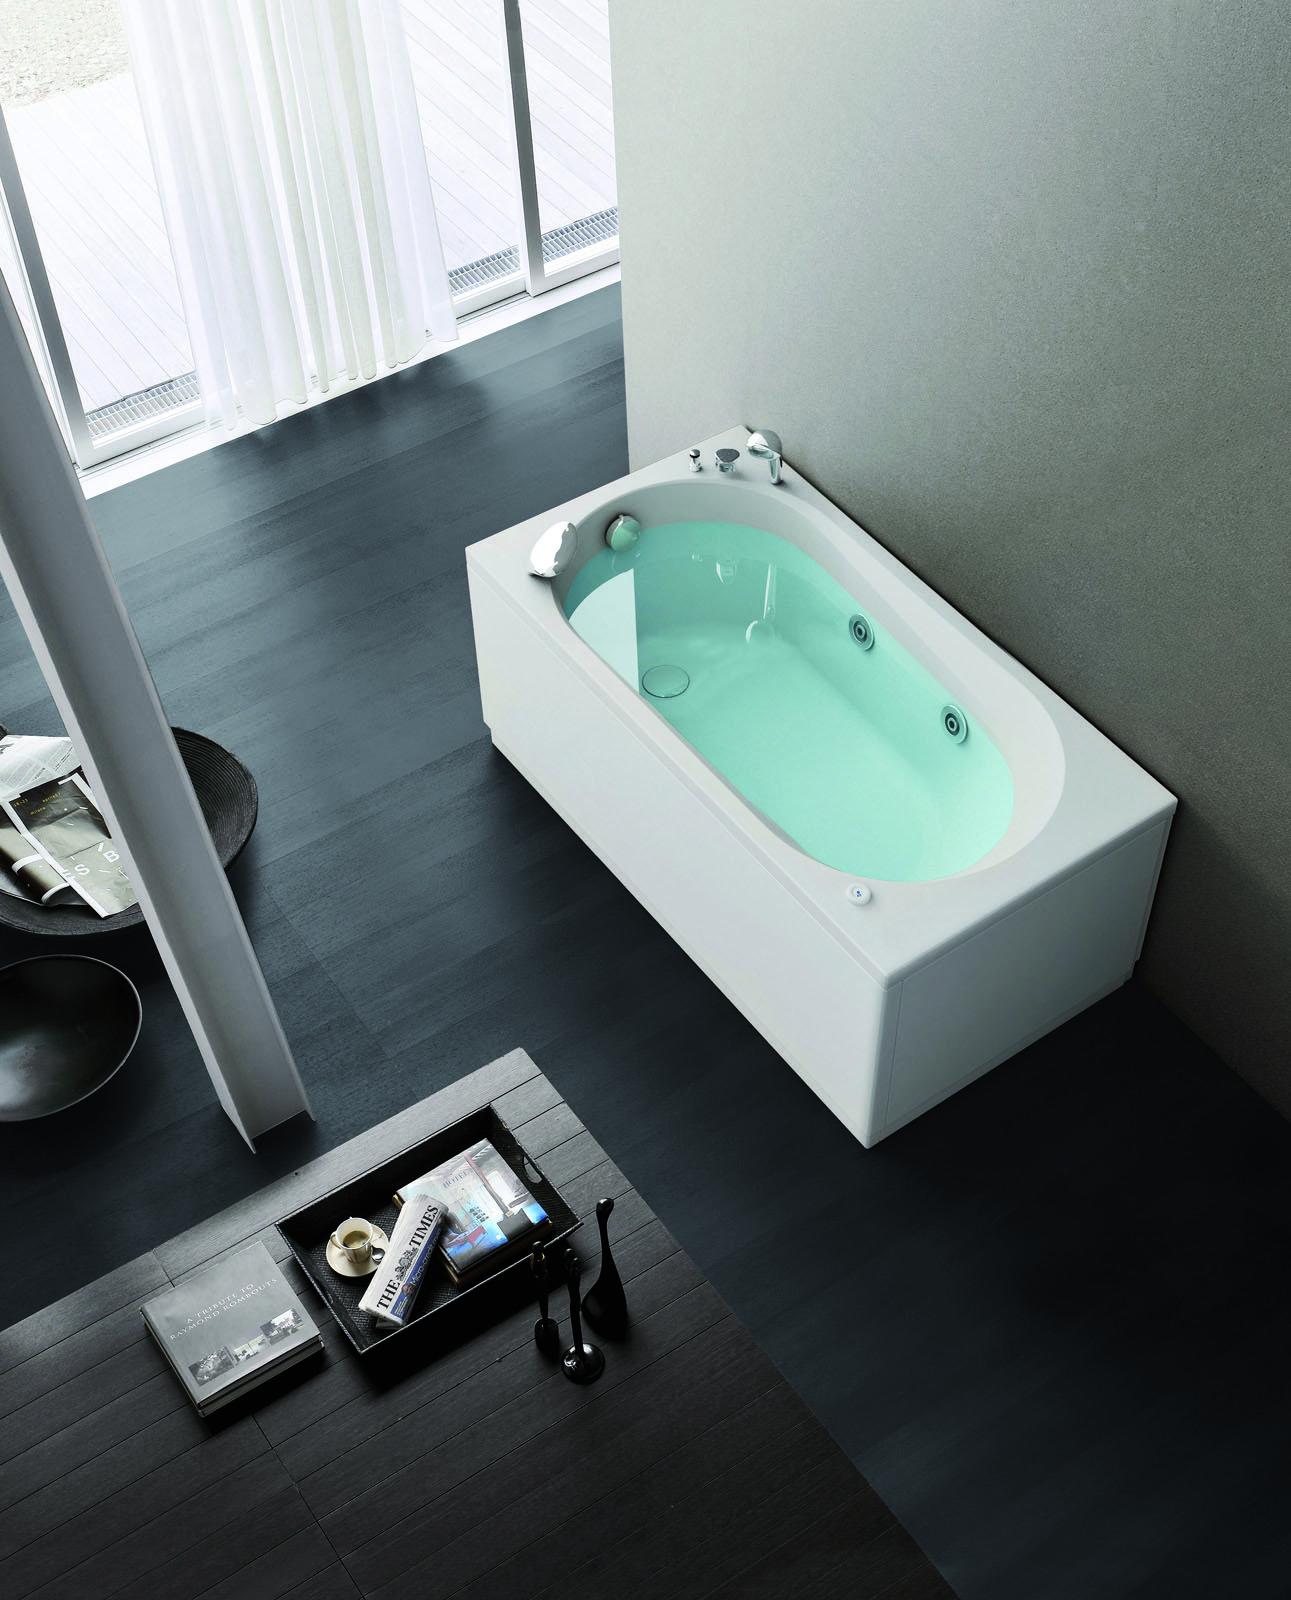 Vasca da bagno 140 cm boiserie in ceramica per bagno - Stucco per vasca da bagno ...